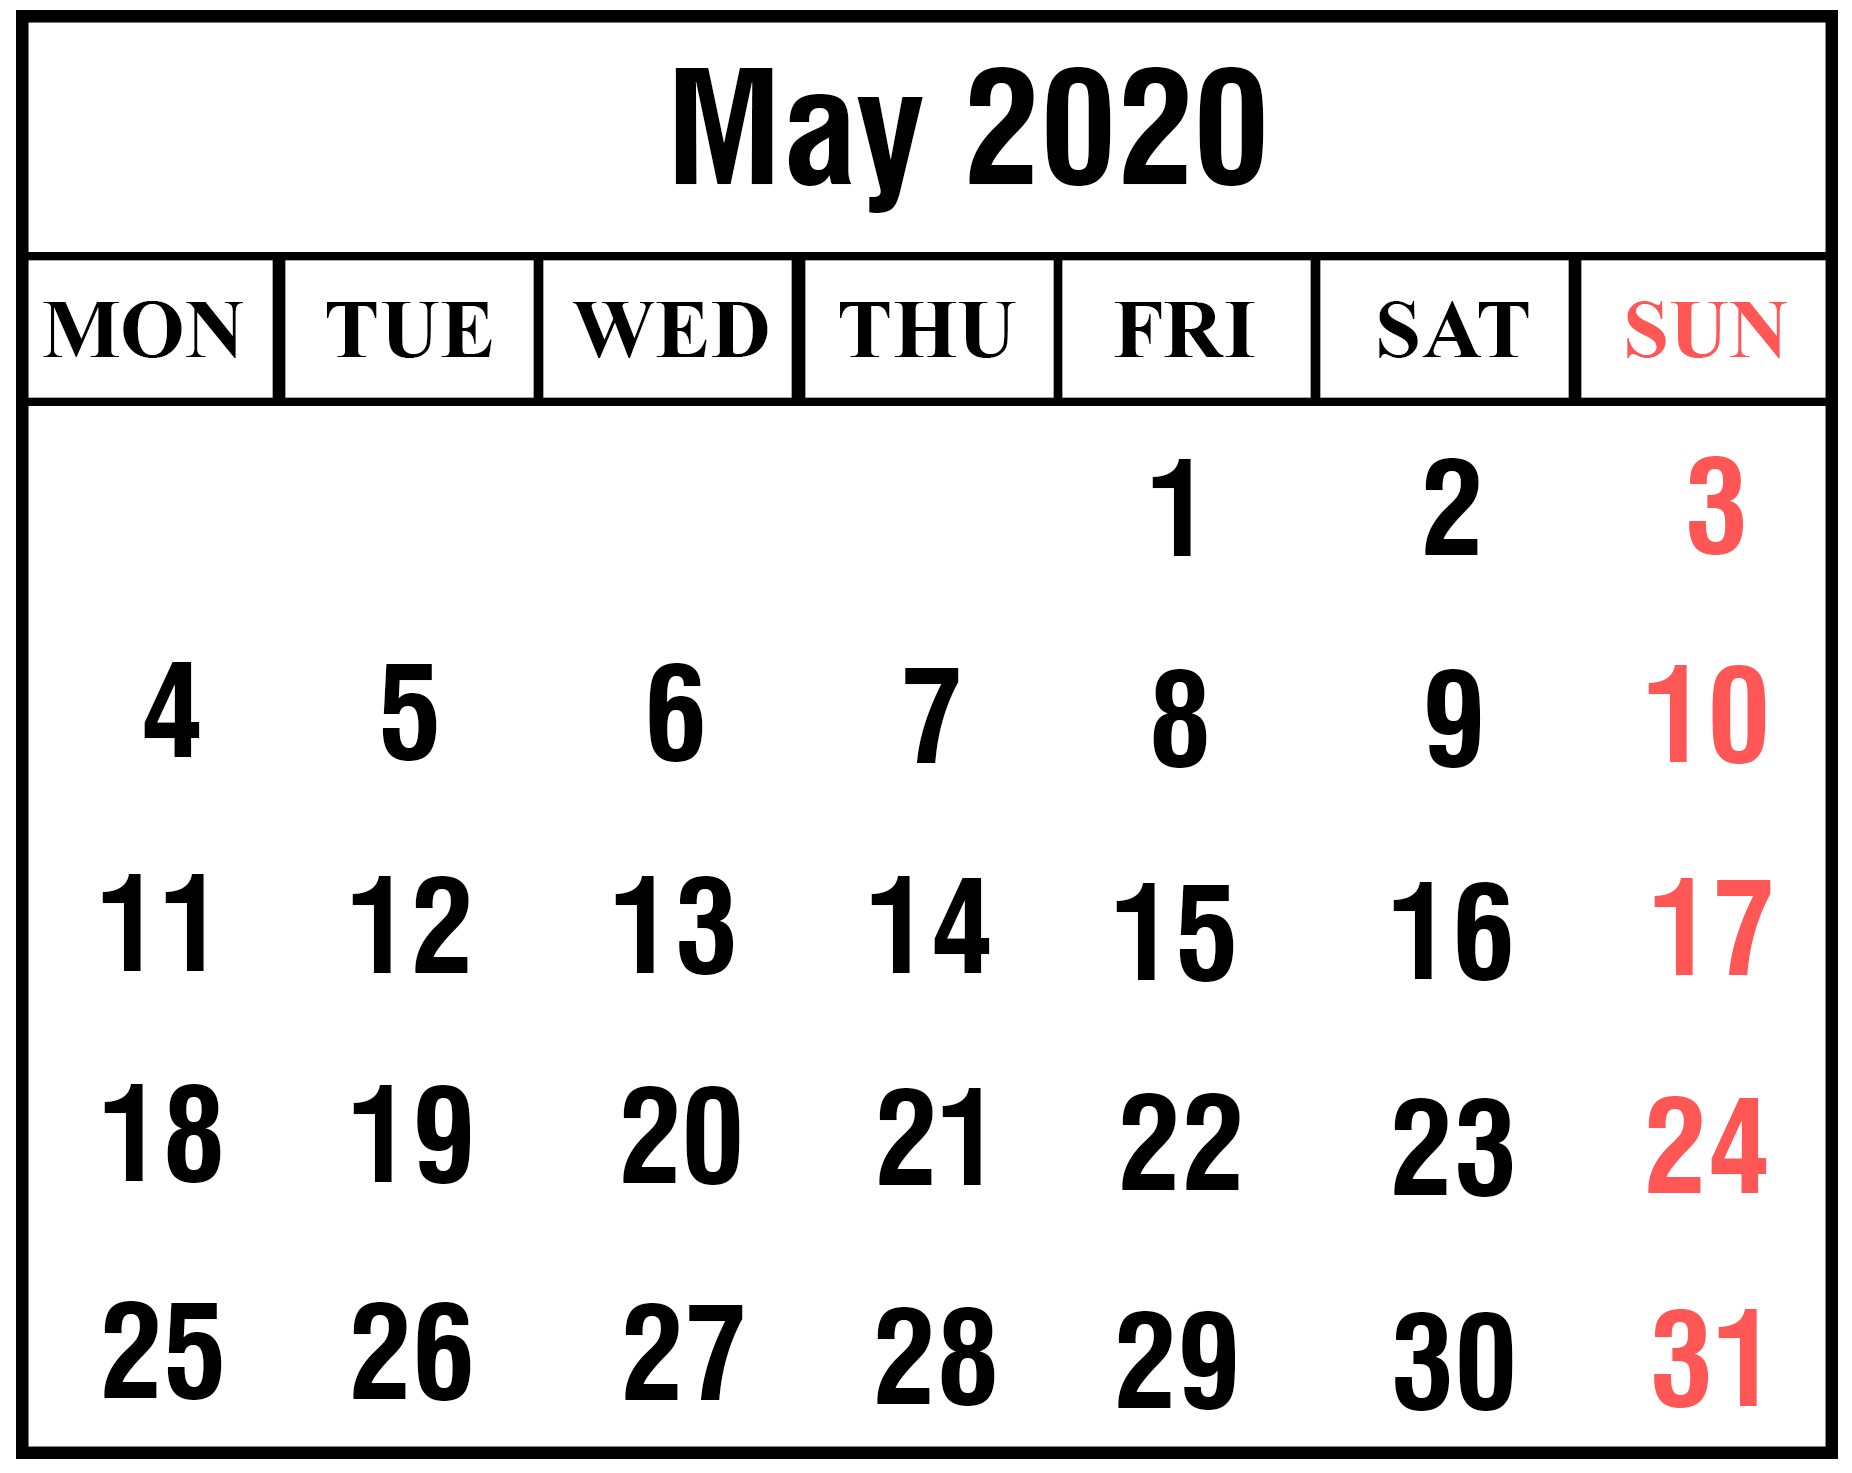 Calendar May 2020 Printable Template